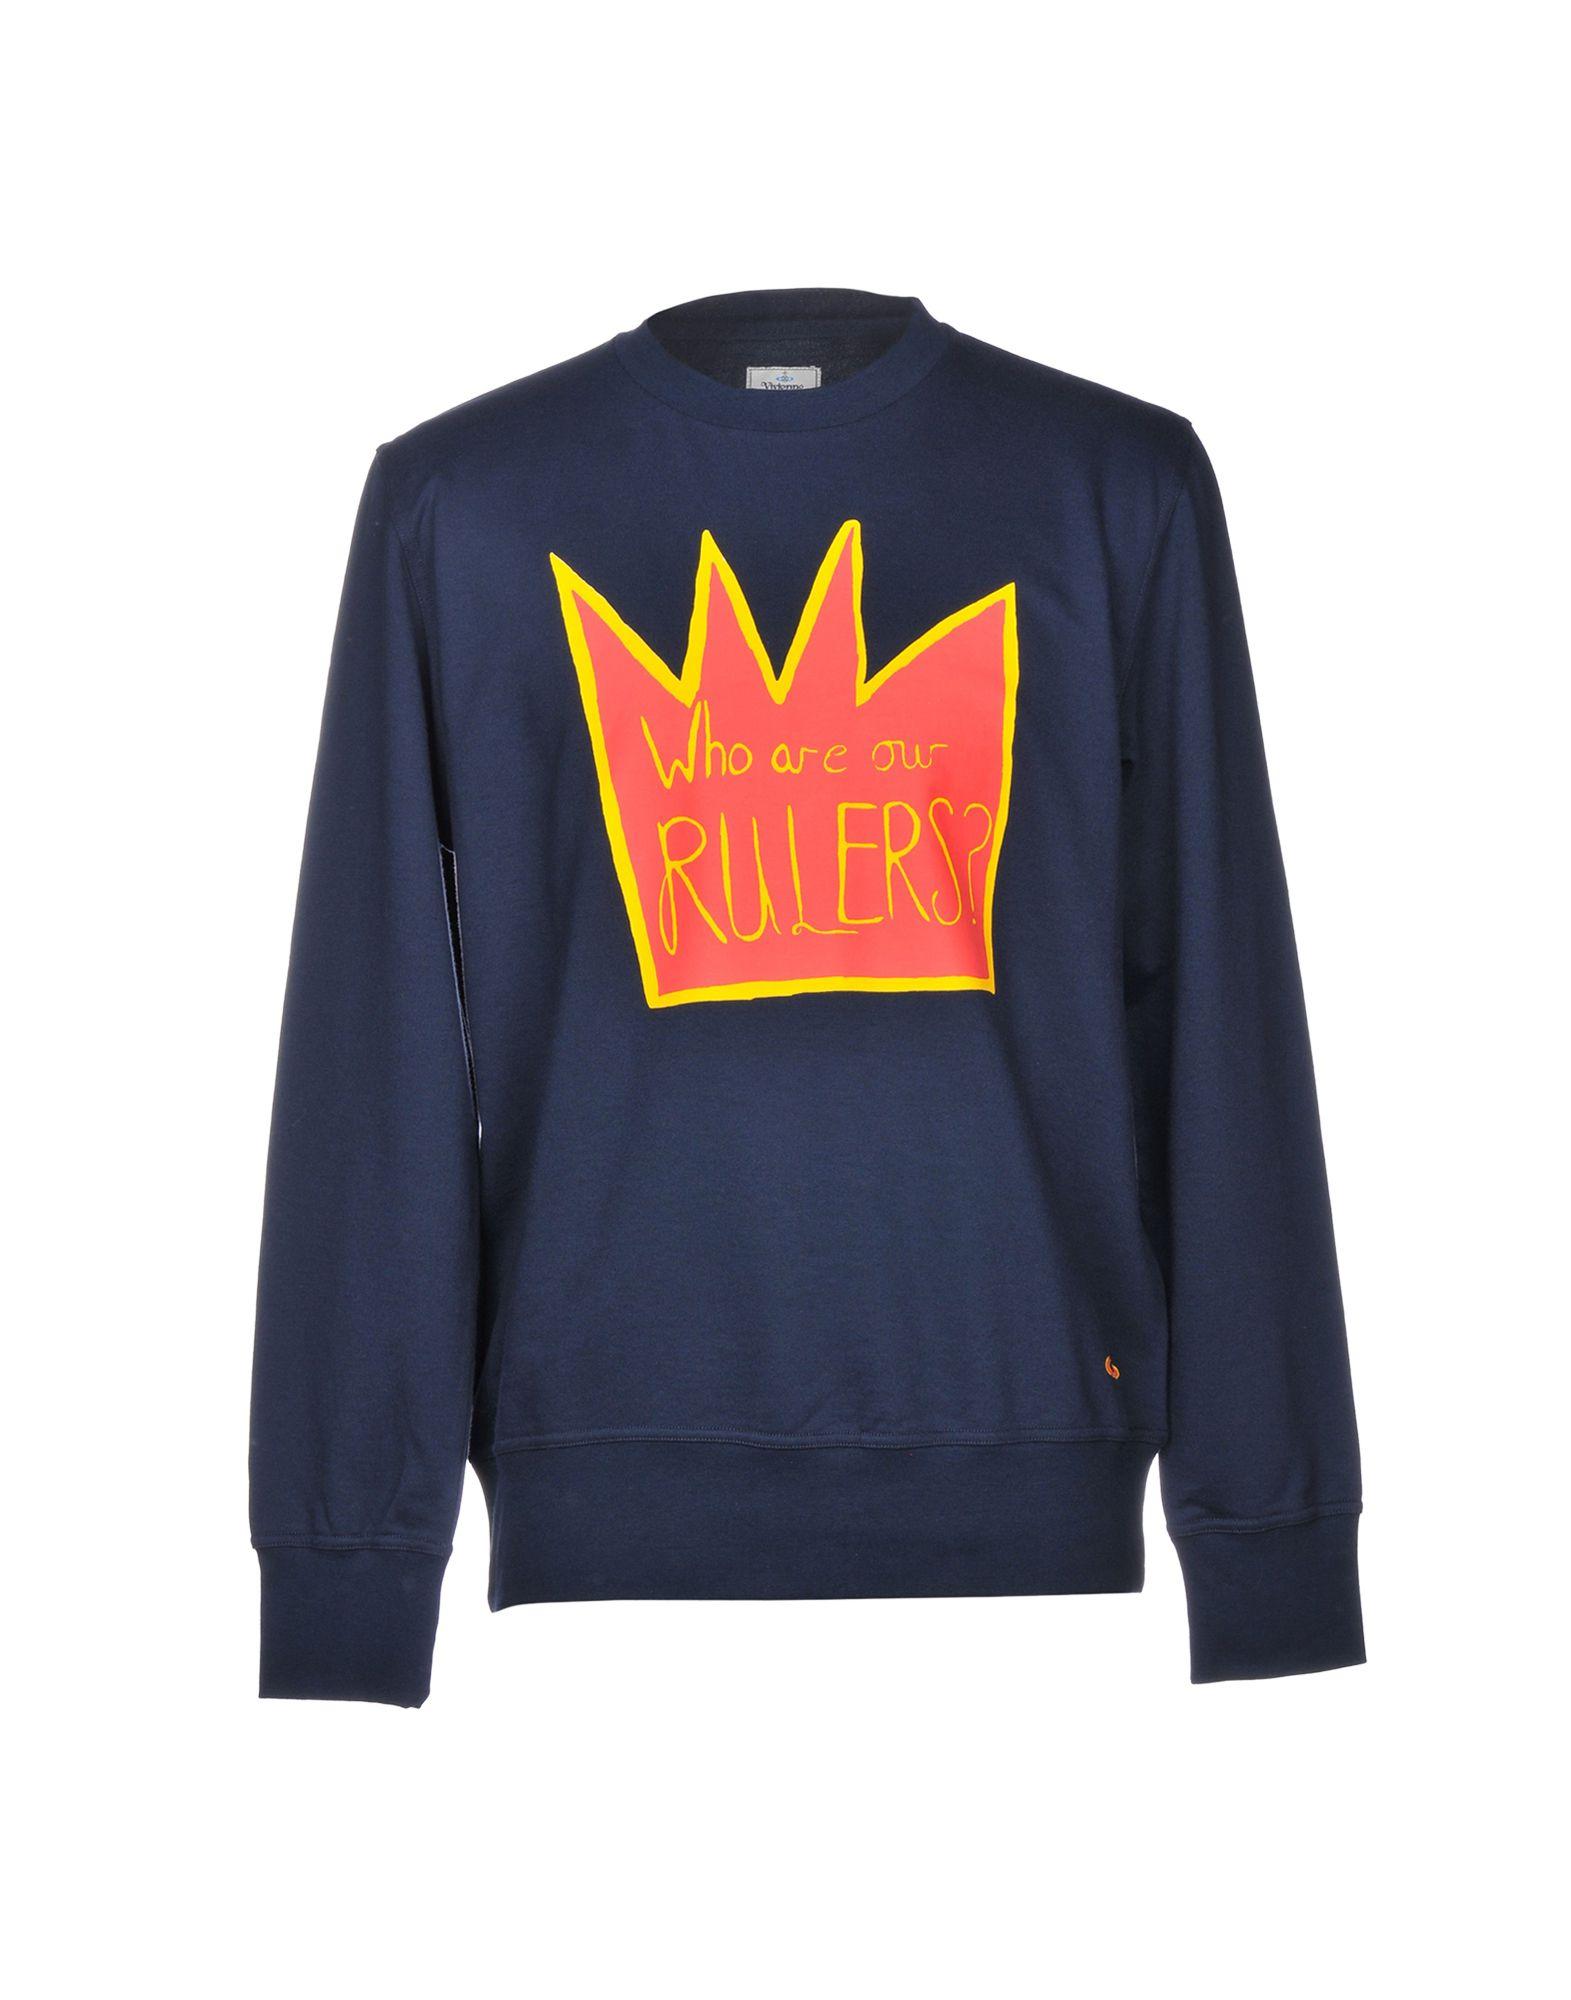 VIVIENNE WESTWOOD MAN Sweatshirt in Dark Blue